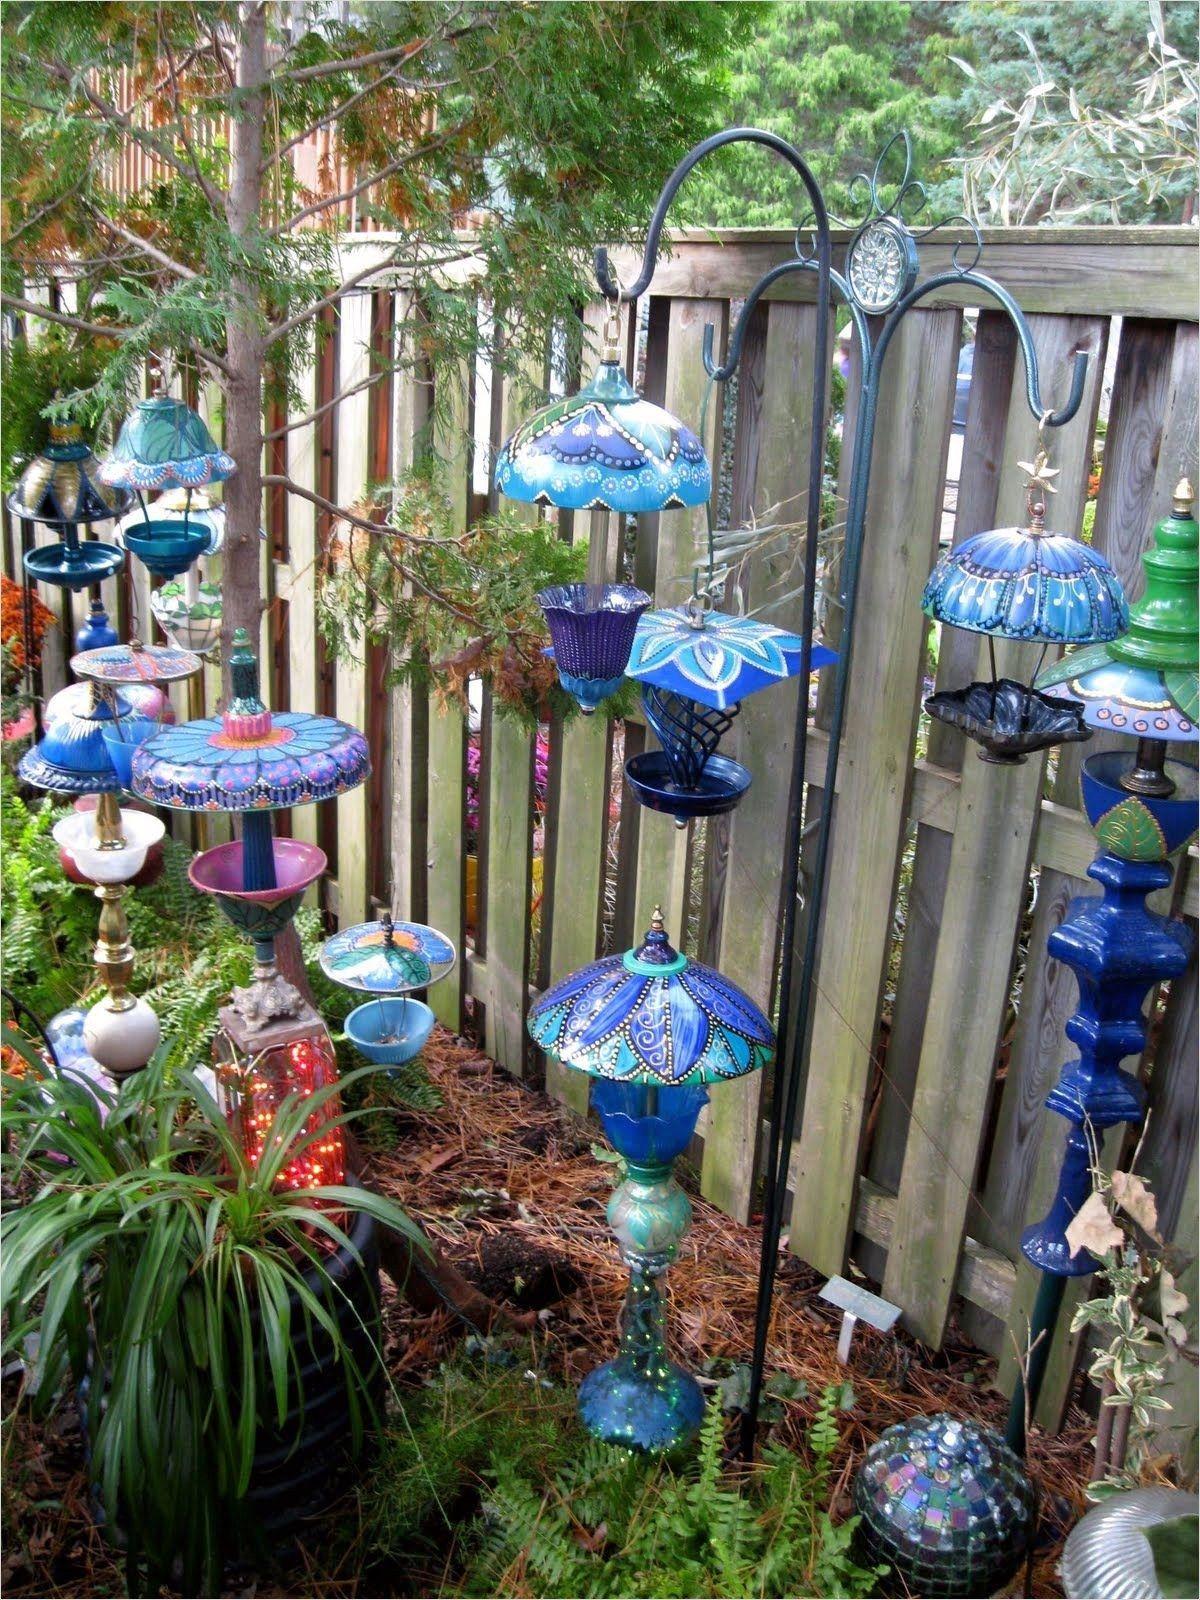 23 Amazing Whimsical Garden Ideas | Glass garden art ... on Whimsical Backyard Ideas id=38712